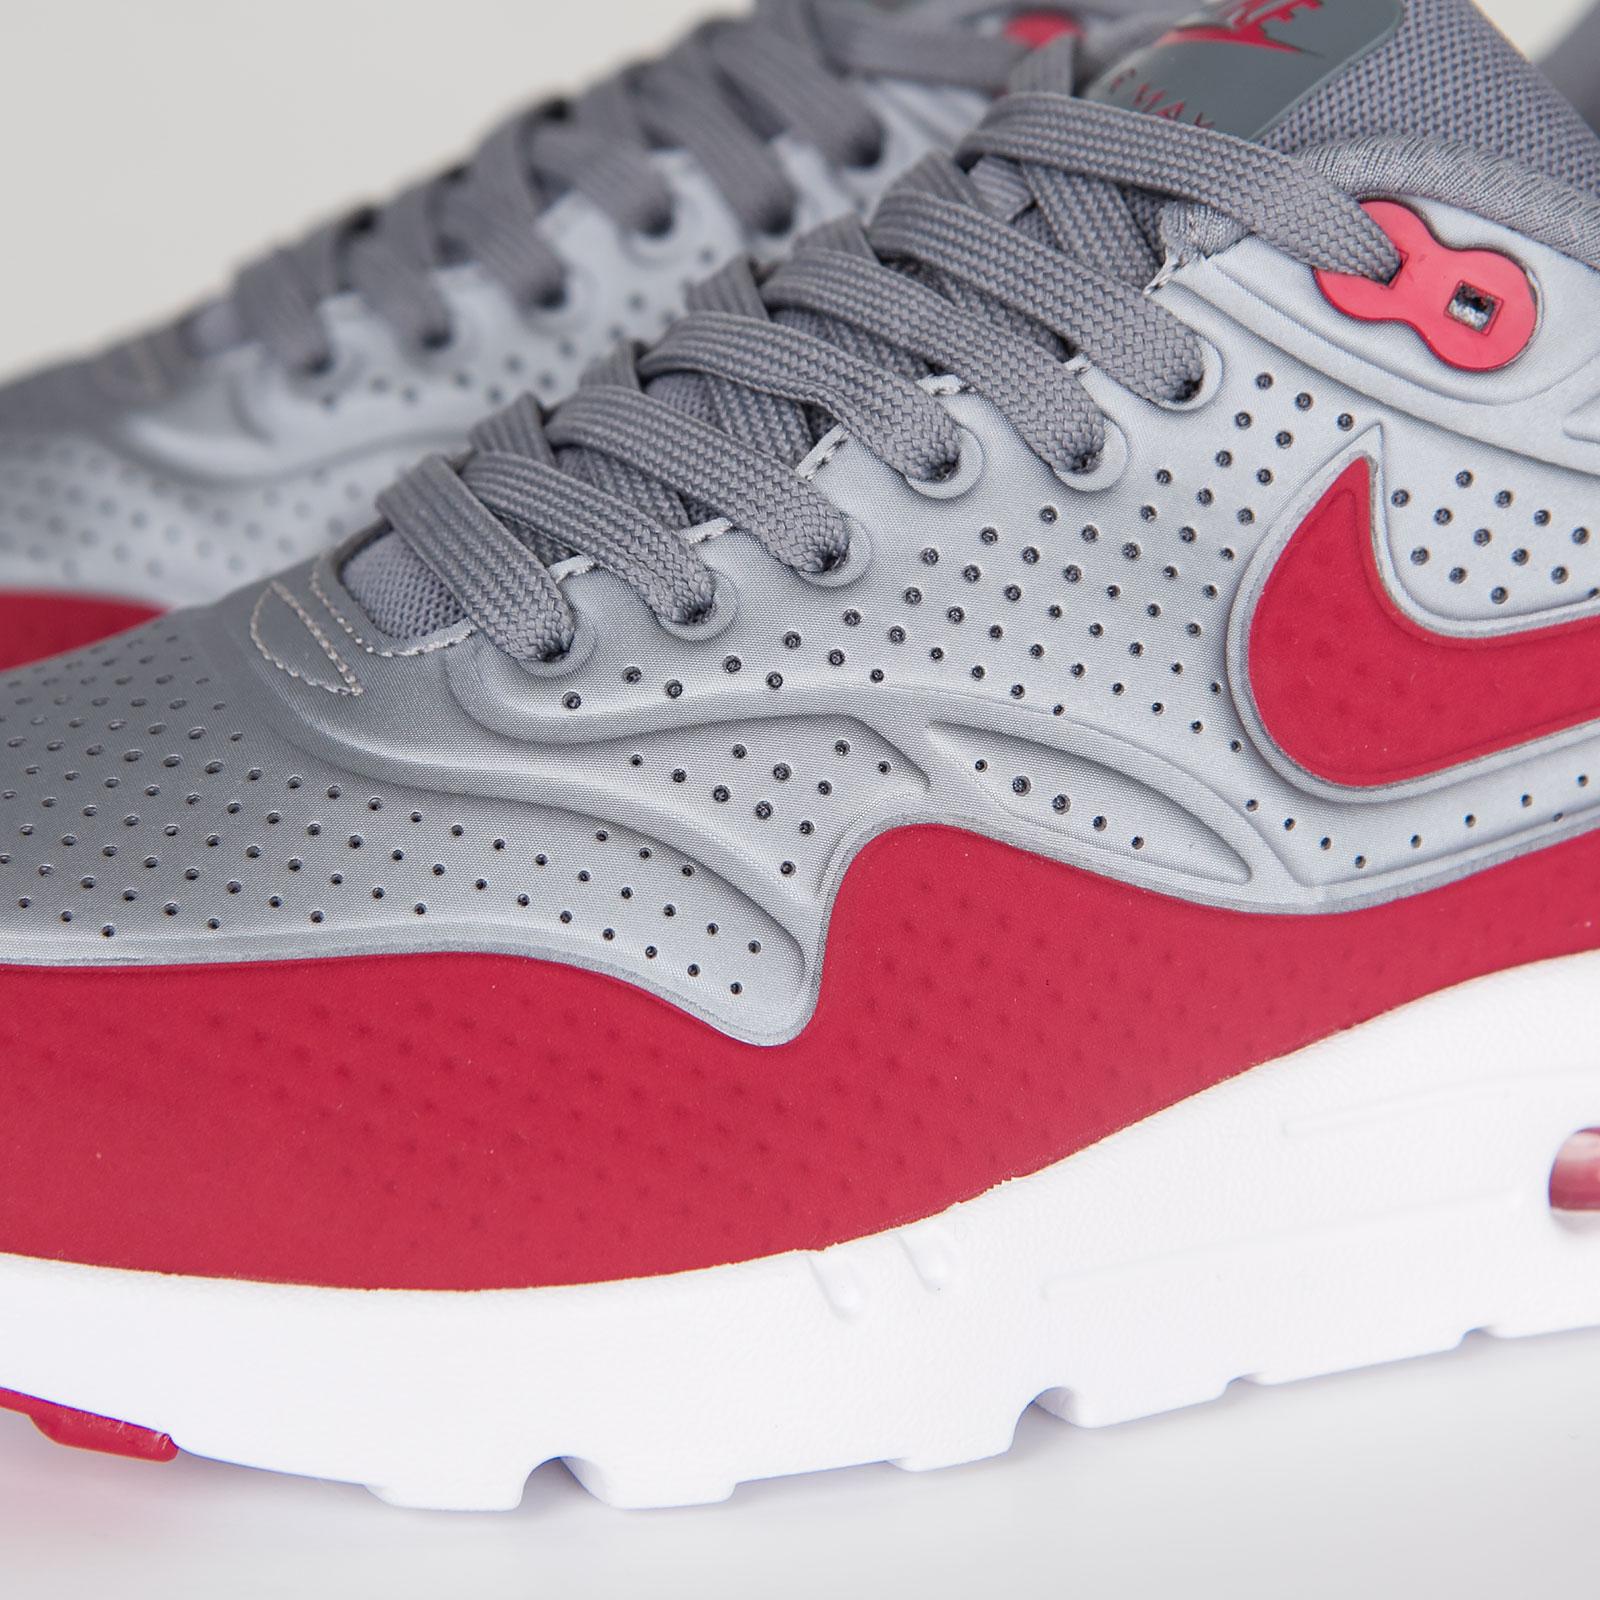 Nike Air Max 1 Ultra Moire 705297 006 Sneakersnstuff